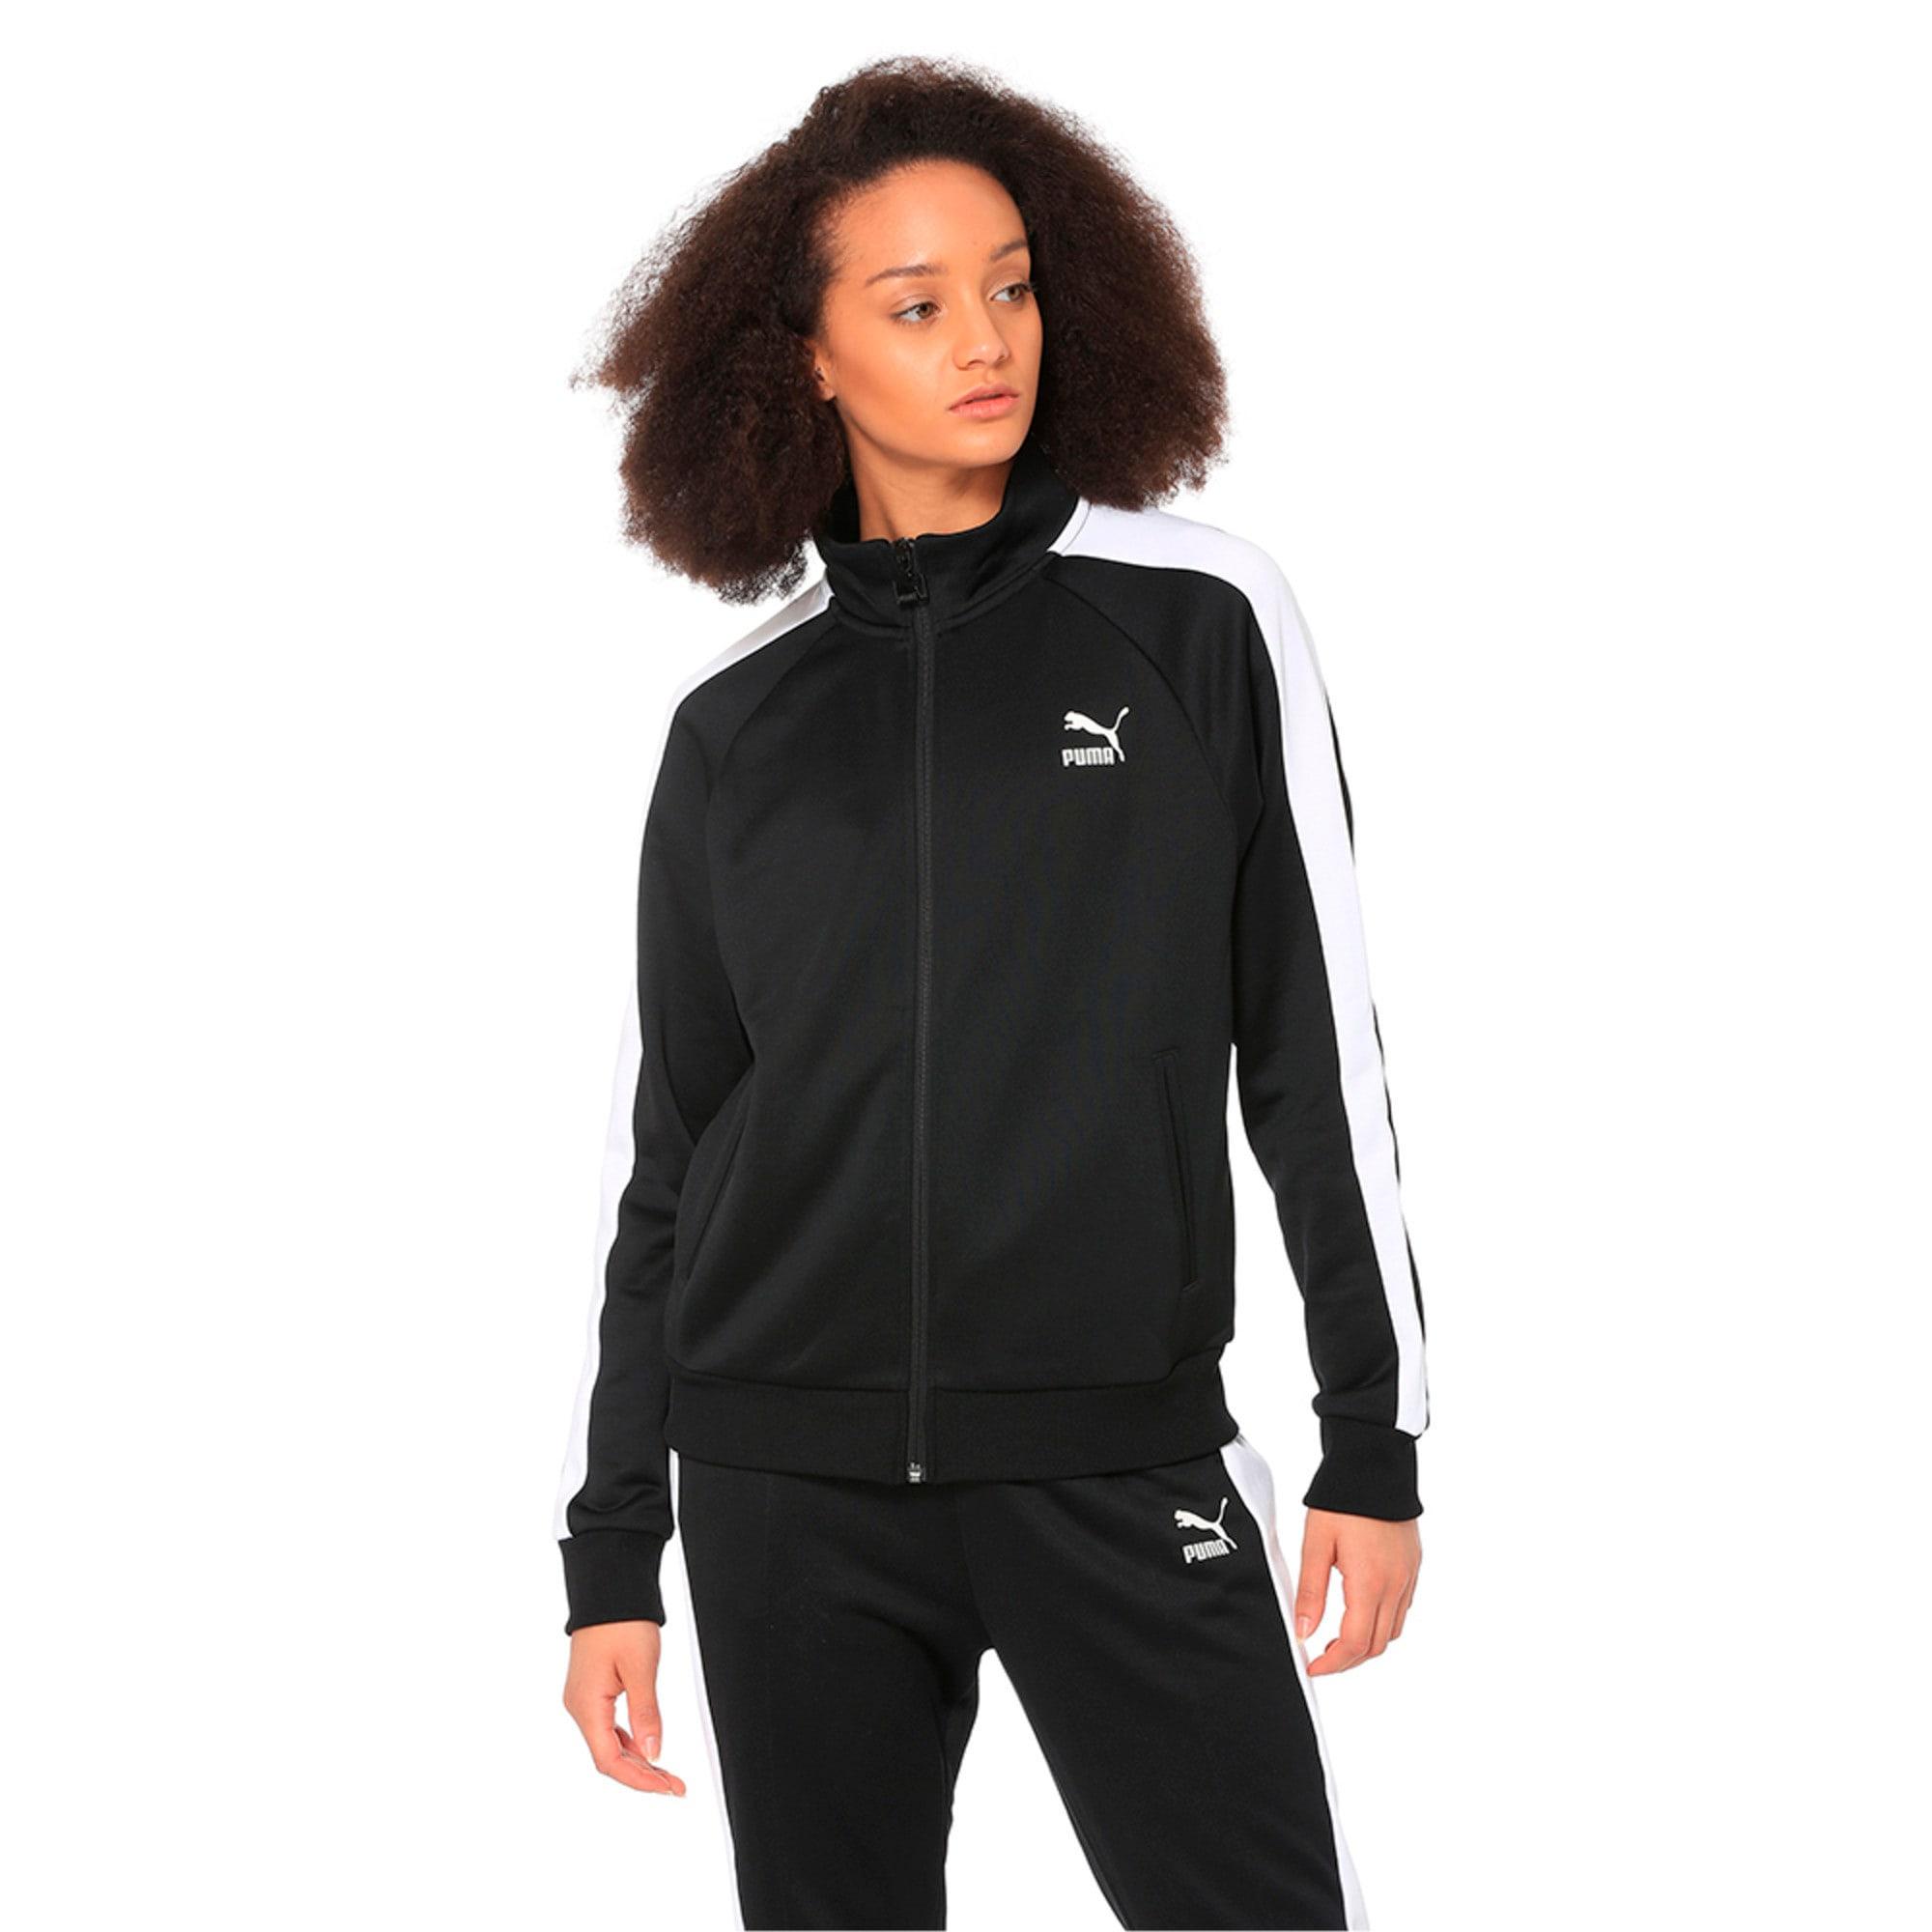 Thumbnail 1 of Classics T7 PT Women's Track Jacket, Puma Black-1, medium-IND